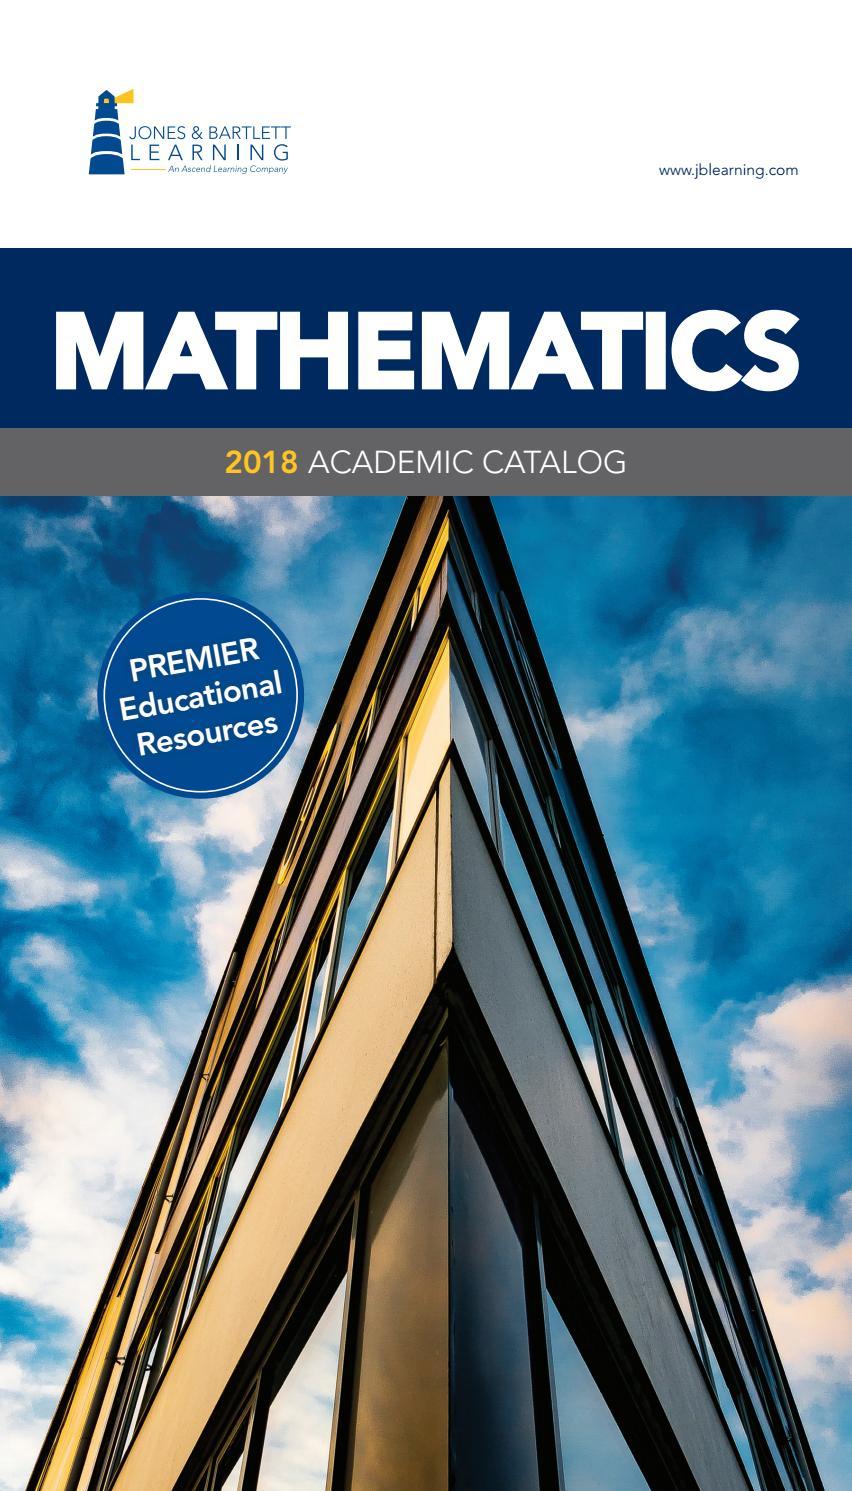 2018 Mathemathics Catalog By Jones Bartlett Learning Issuu